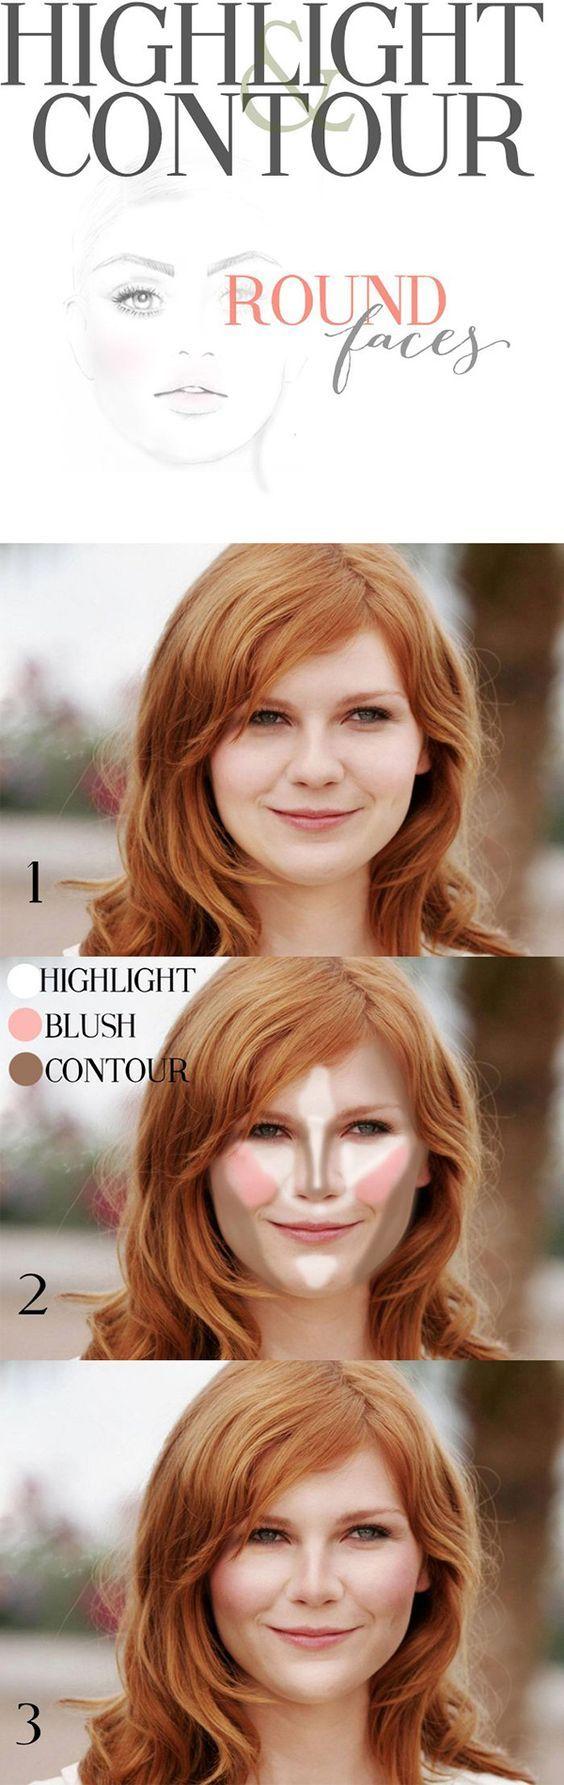 20 Highlighting and Contouring Makeup Hacks Tips Tricks | Gurl.com